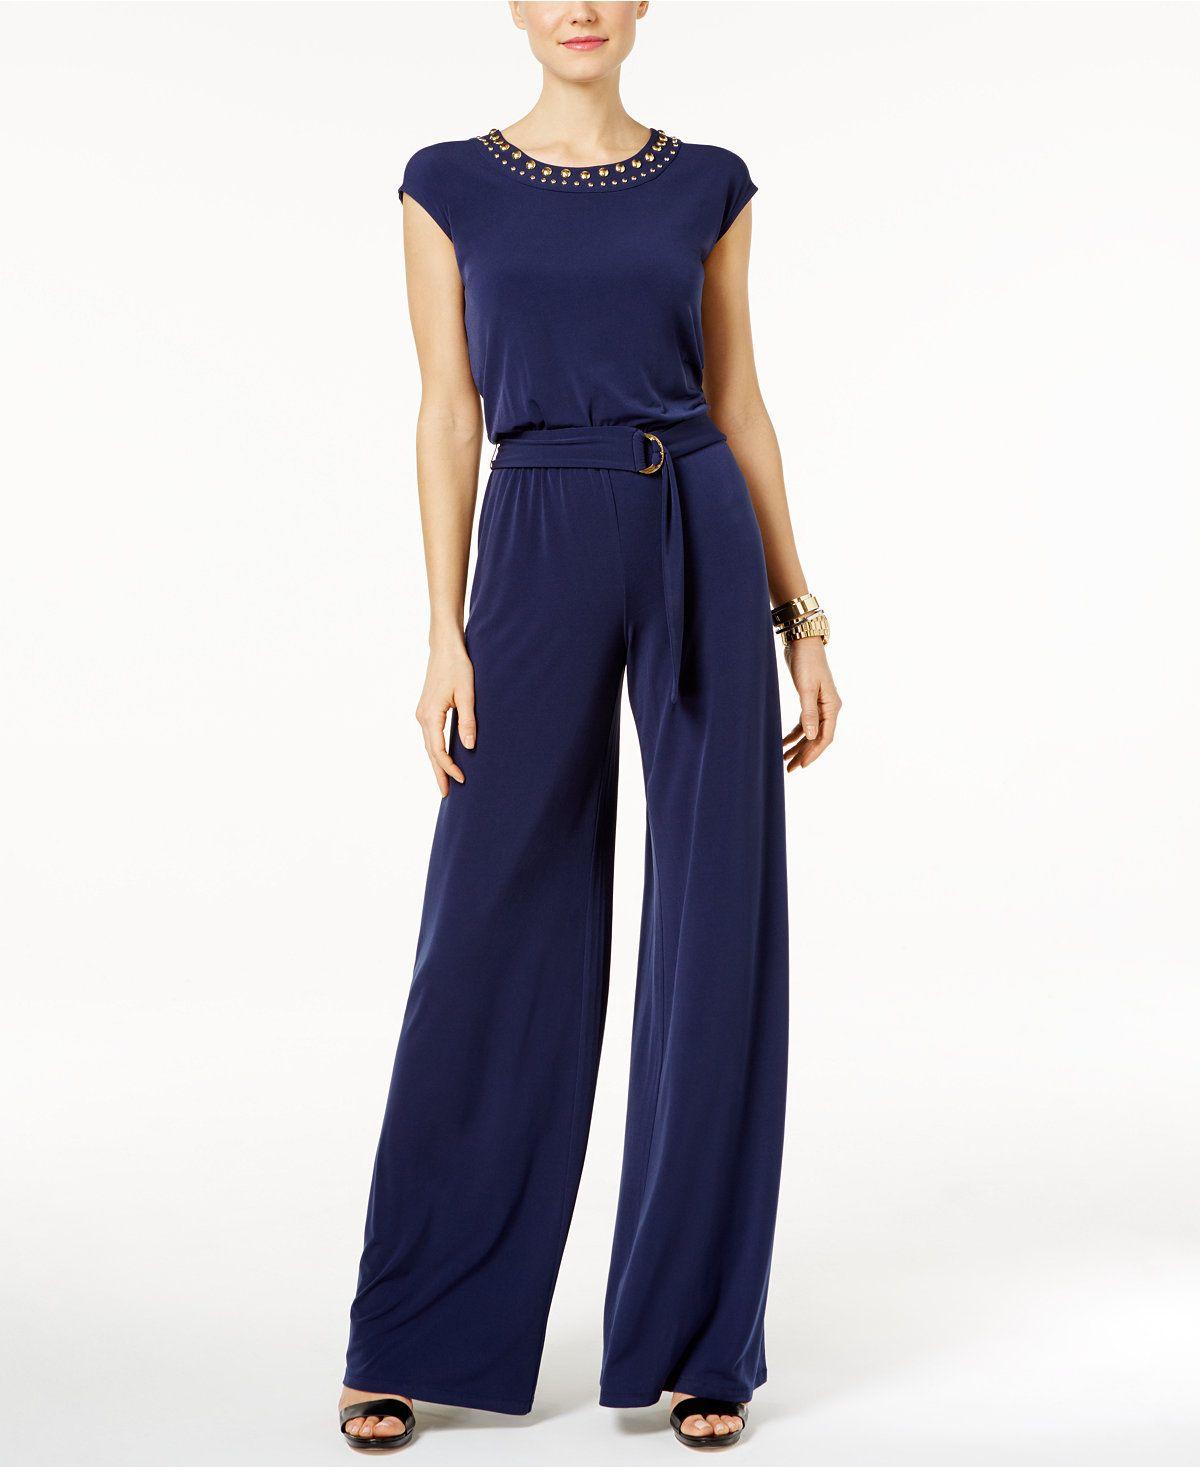 18367aa8b7f2 MICHAEL Michael Kors Petite Embellished Wide-Leg Jumpsuit - Pants   Capris  - Women - Macy s